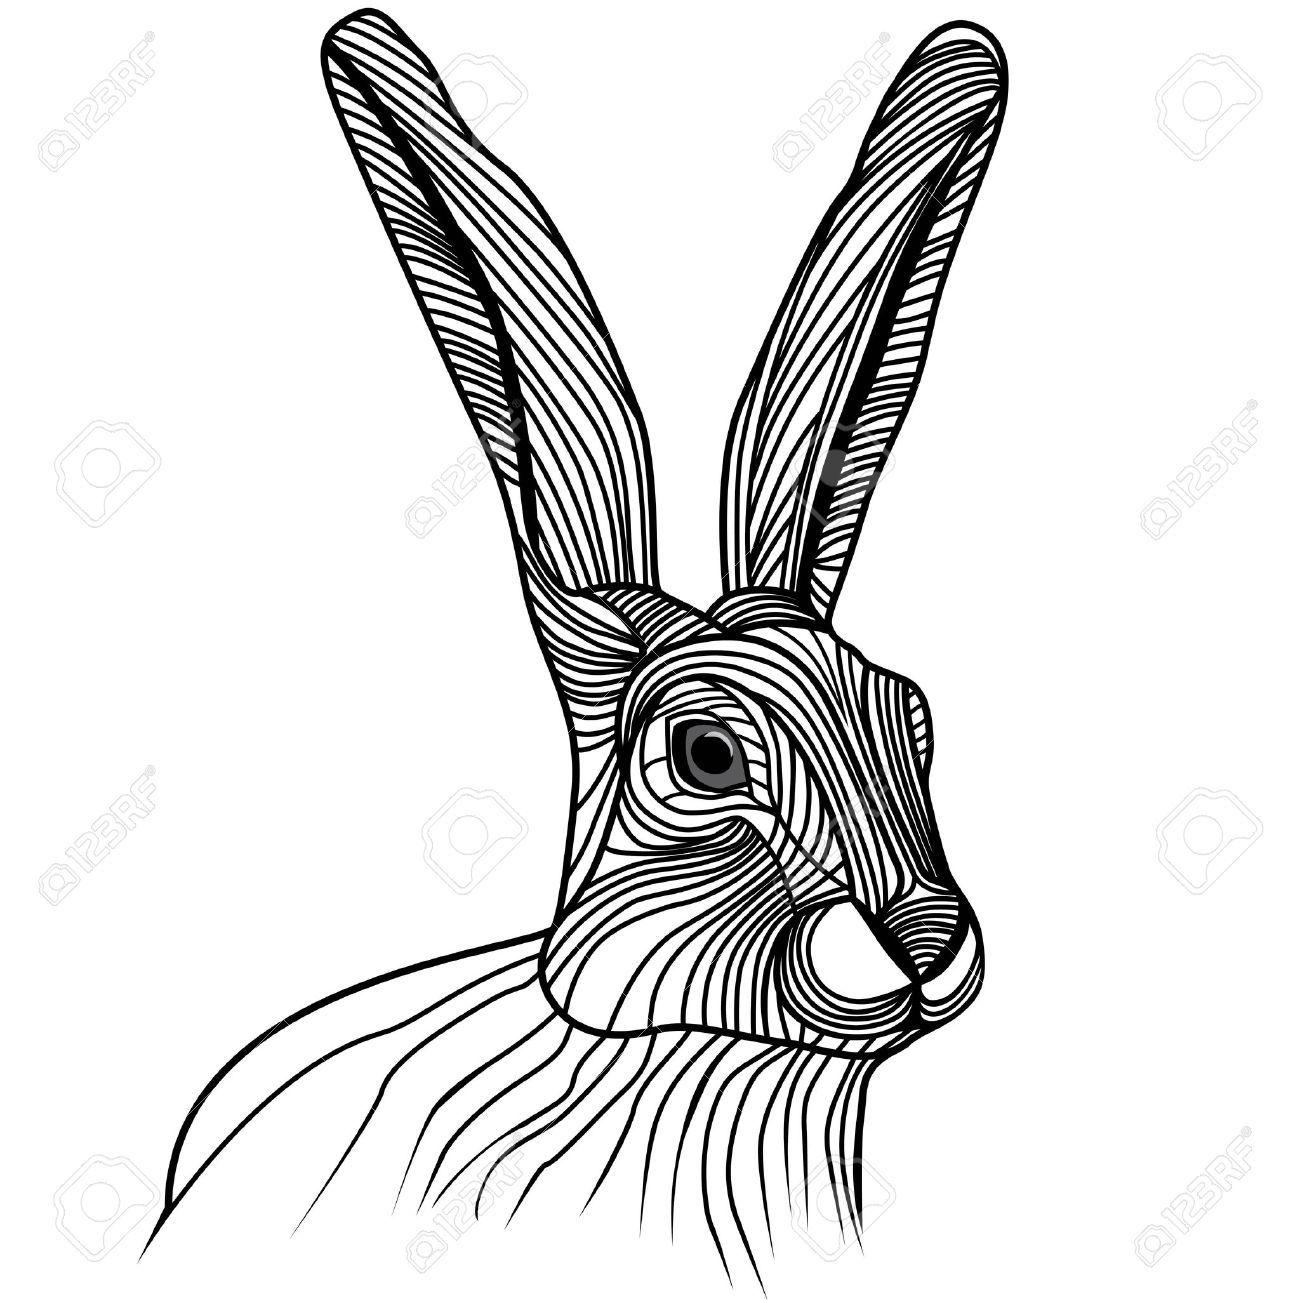 Rabbit Or Hare Head Animal Illustration For T Shirt Sketch